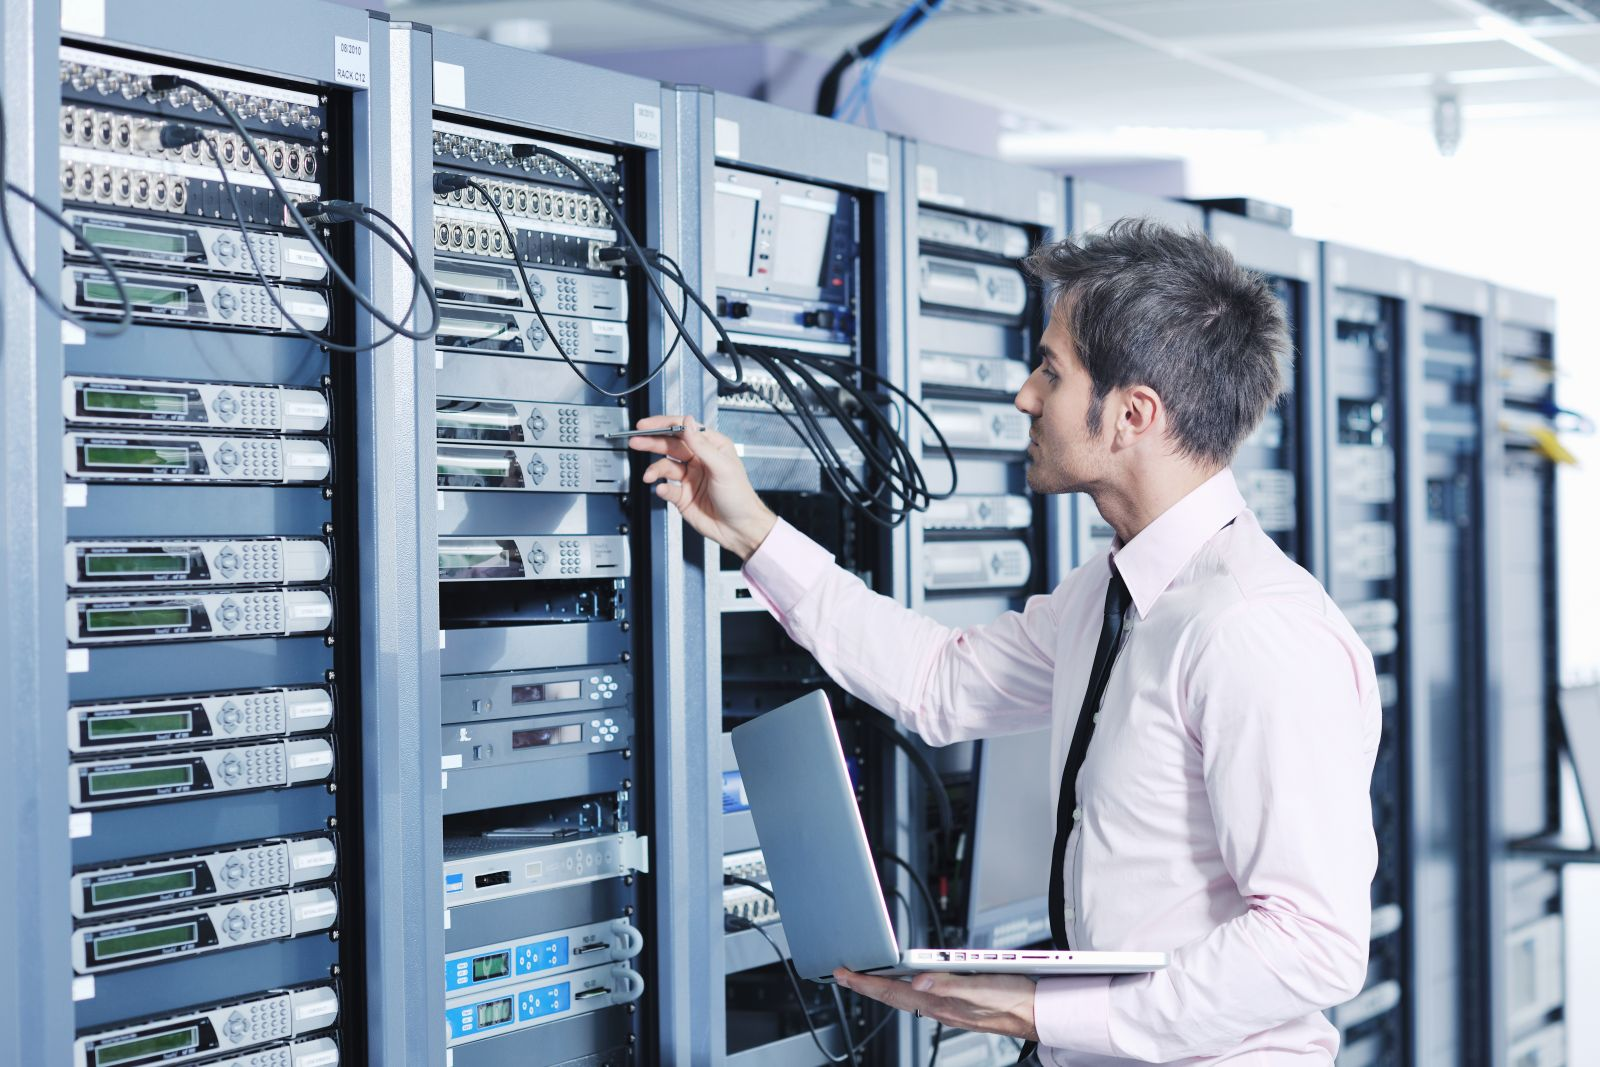 IT-специалист с ноутбуком в руке проверяет сервер